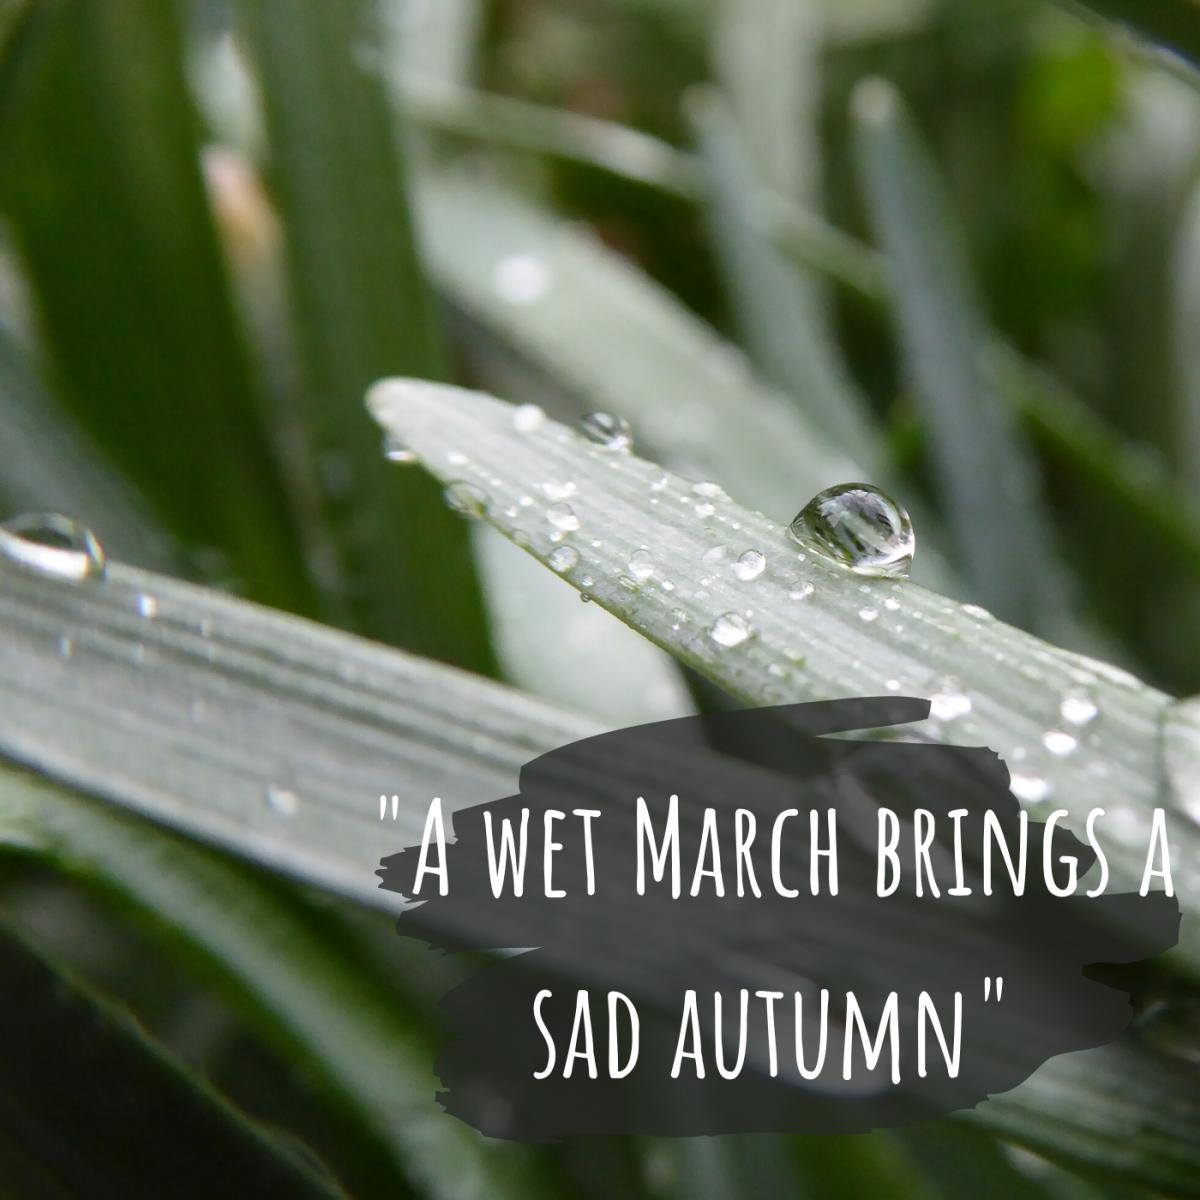 A wet March brings a sad autumn.